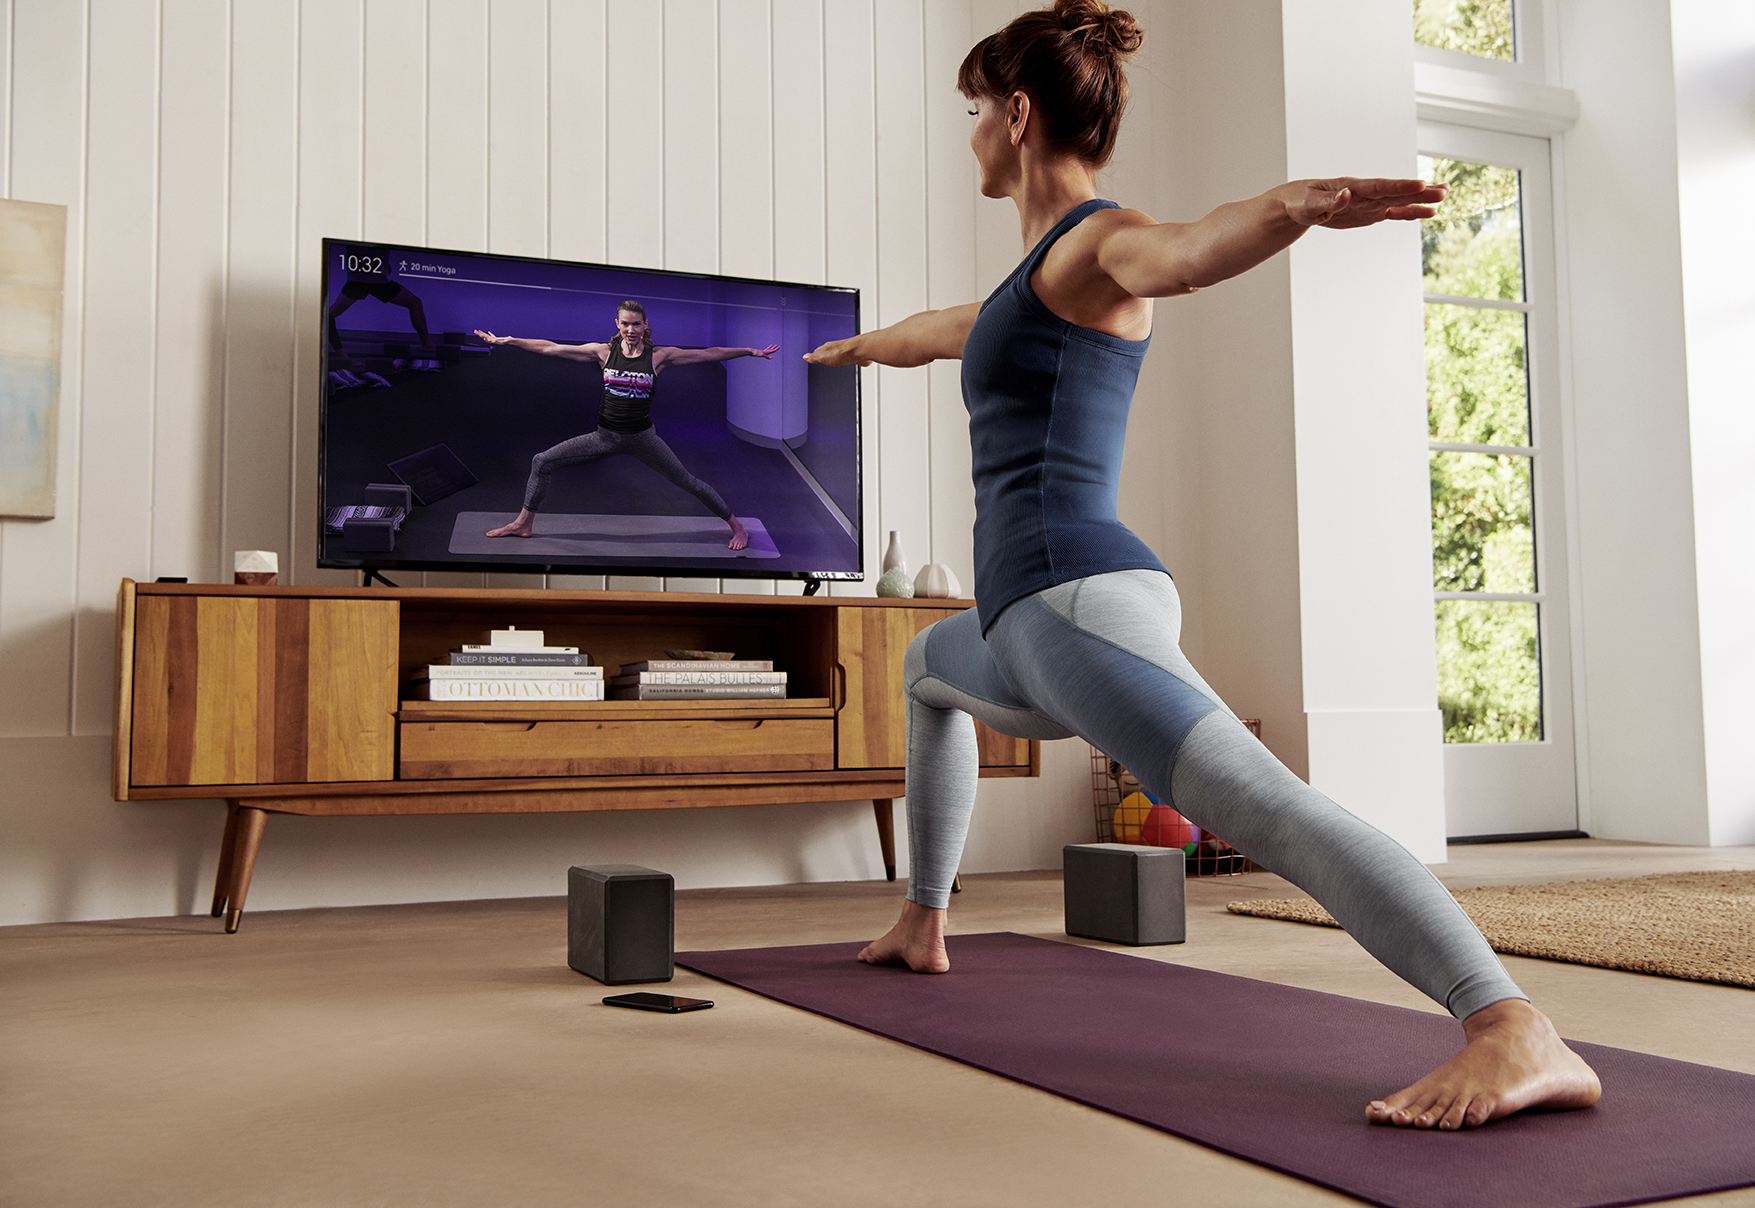 Best Online Fitness Plans